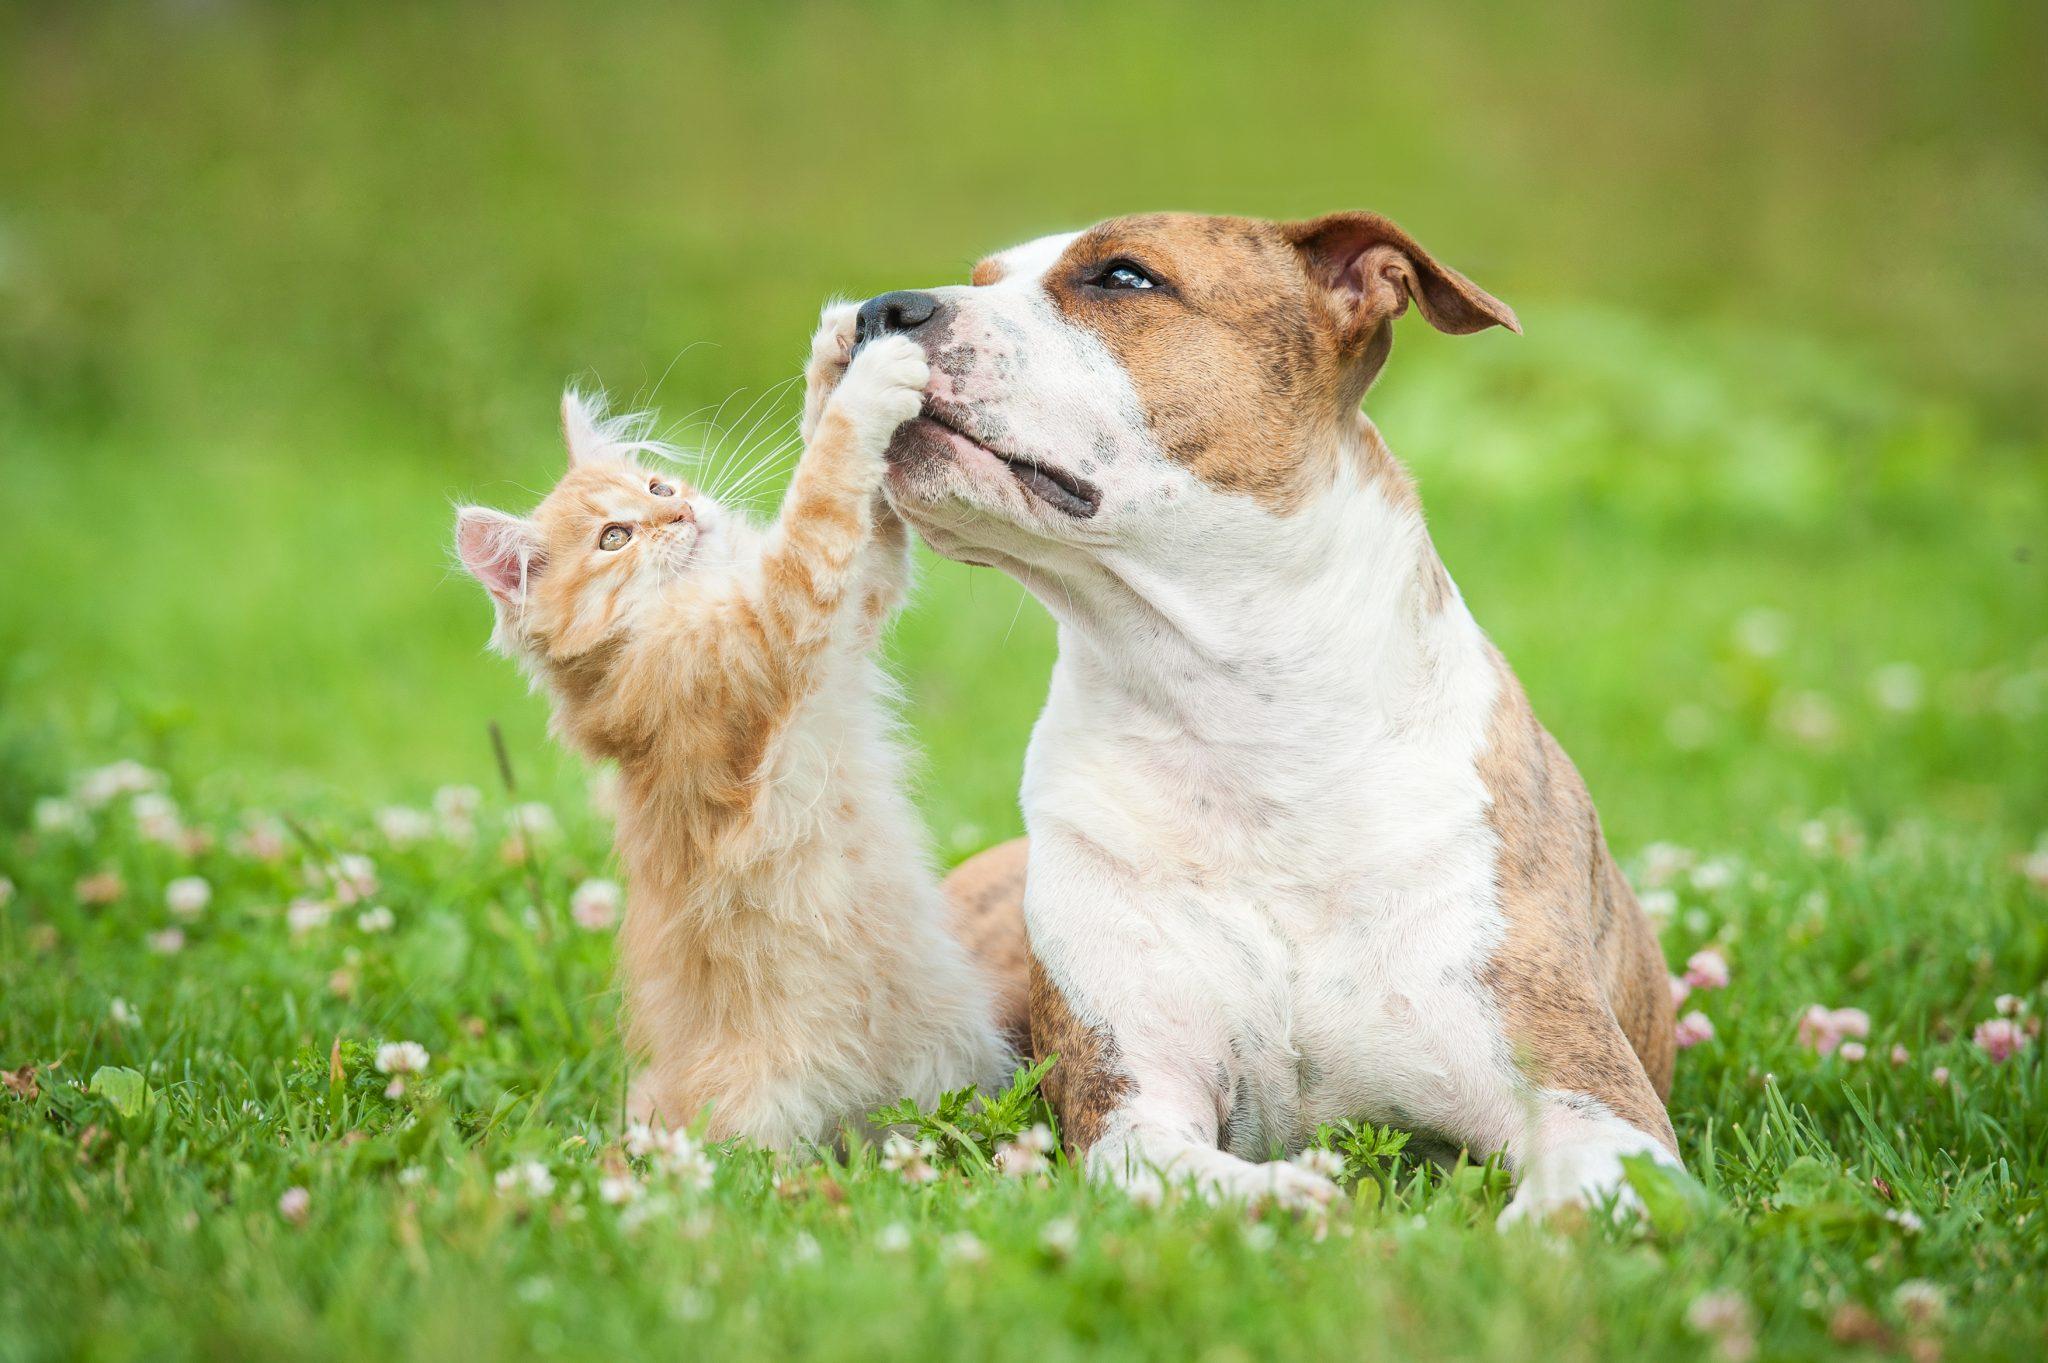 Vernon & Kelowna Yard Fencing - Dog Enclosure | Quality Chain Link Fencing